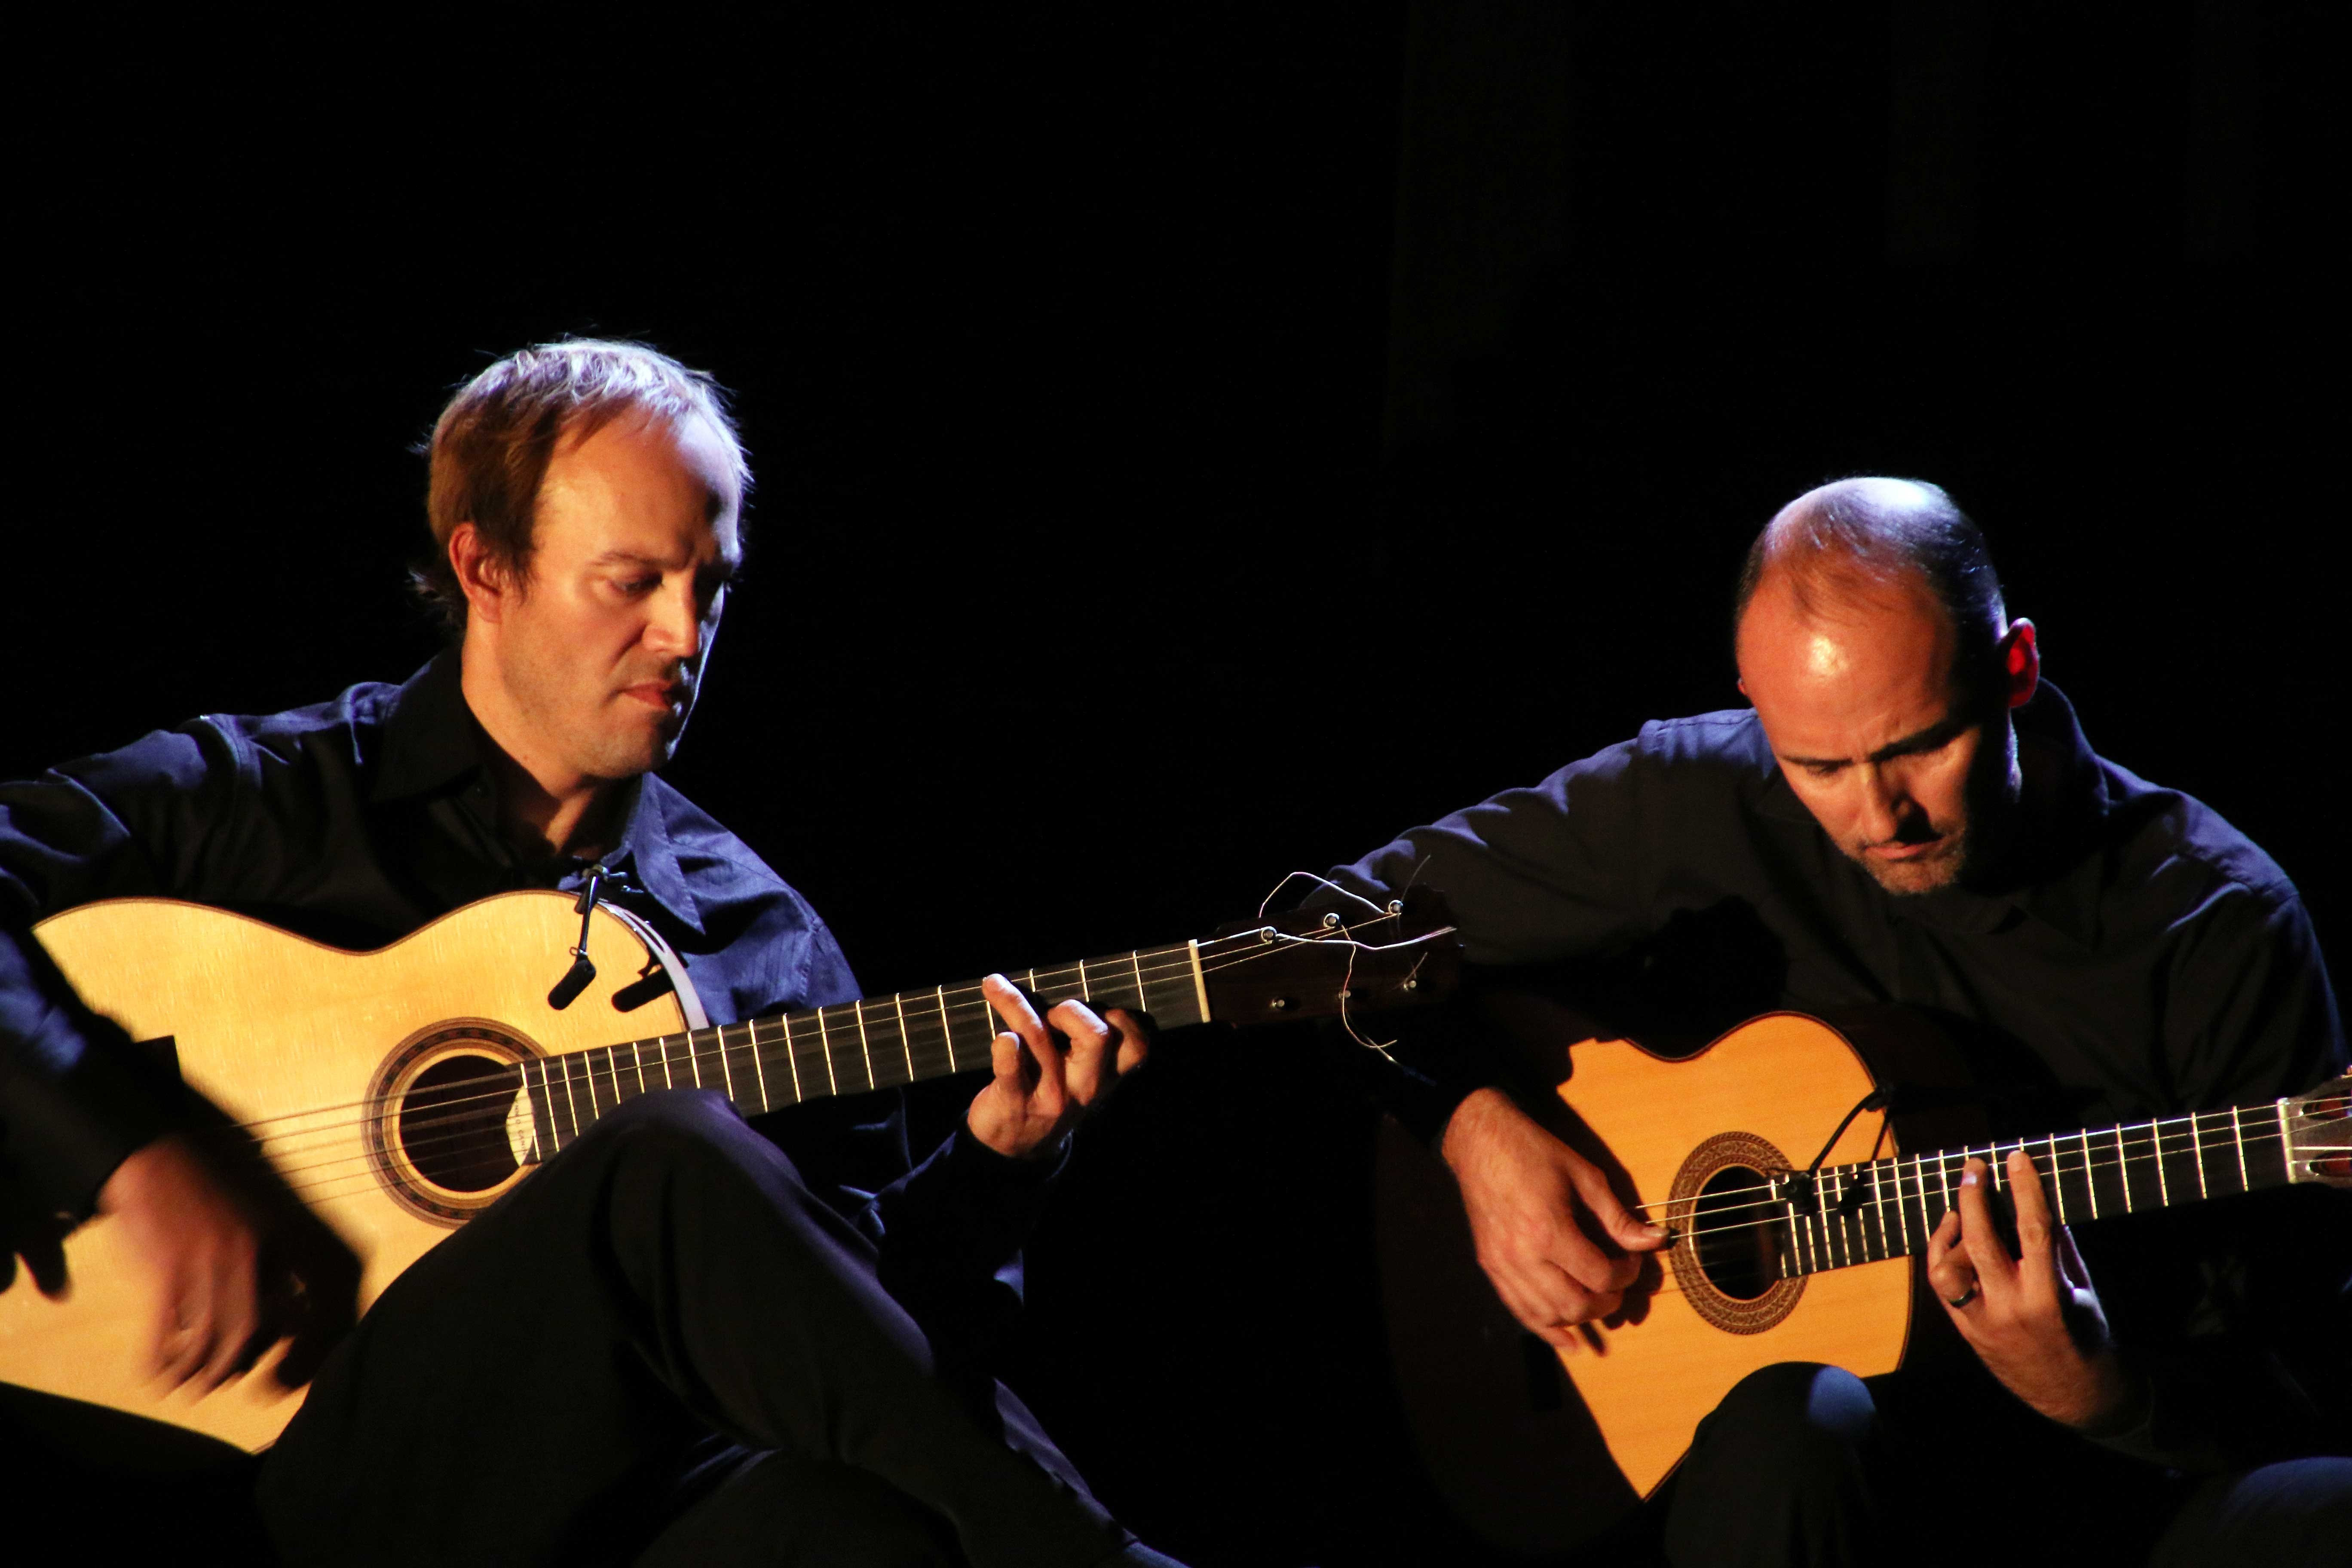 David McLean and Roberto Aguilar